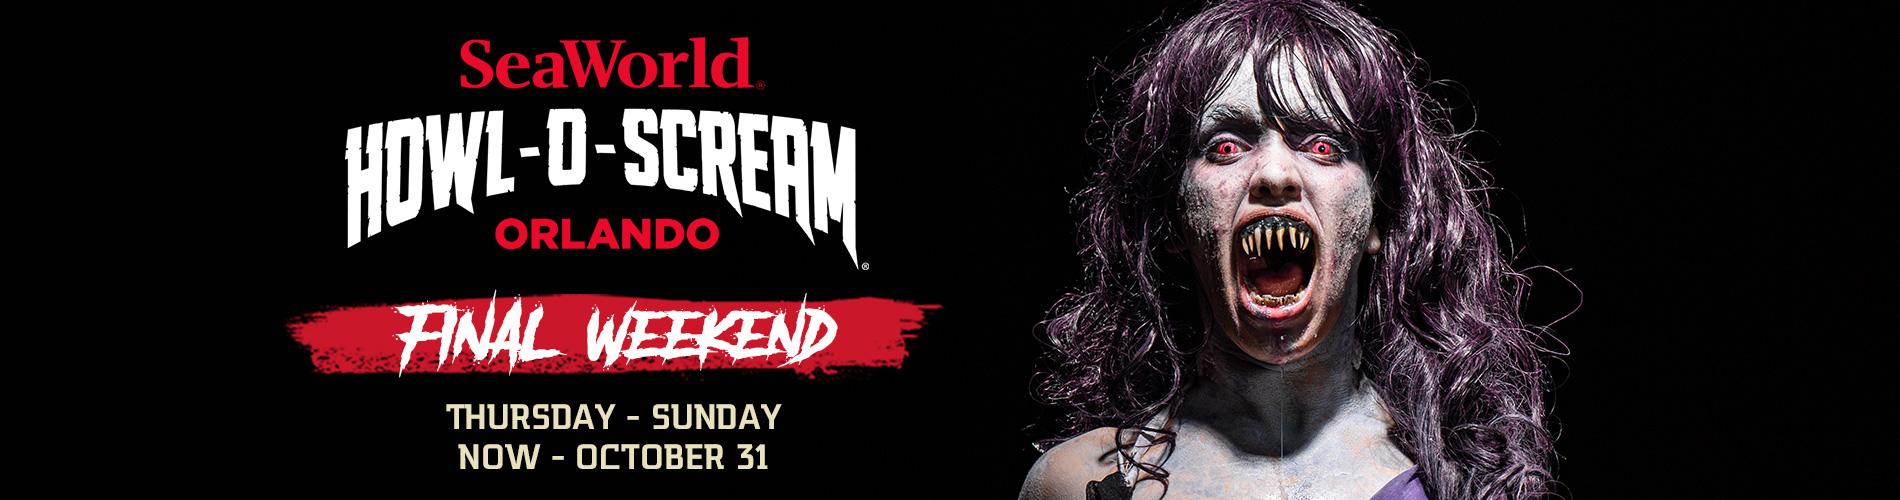 Final Weekend of SeaWorld Orlando Howl-O-Scream